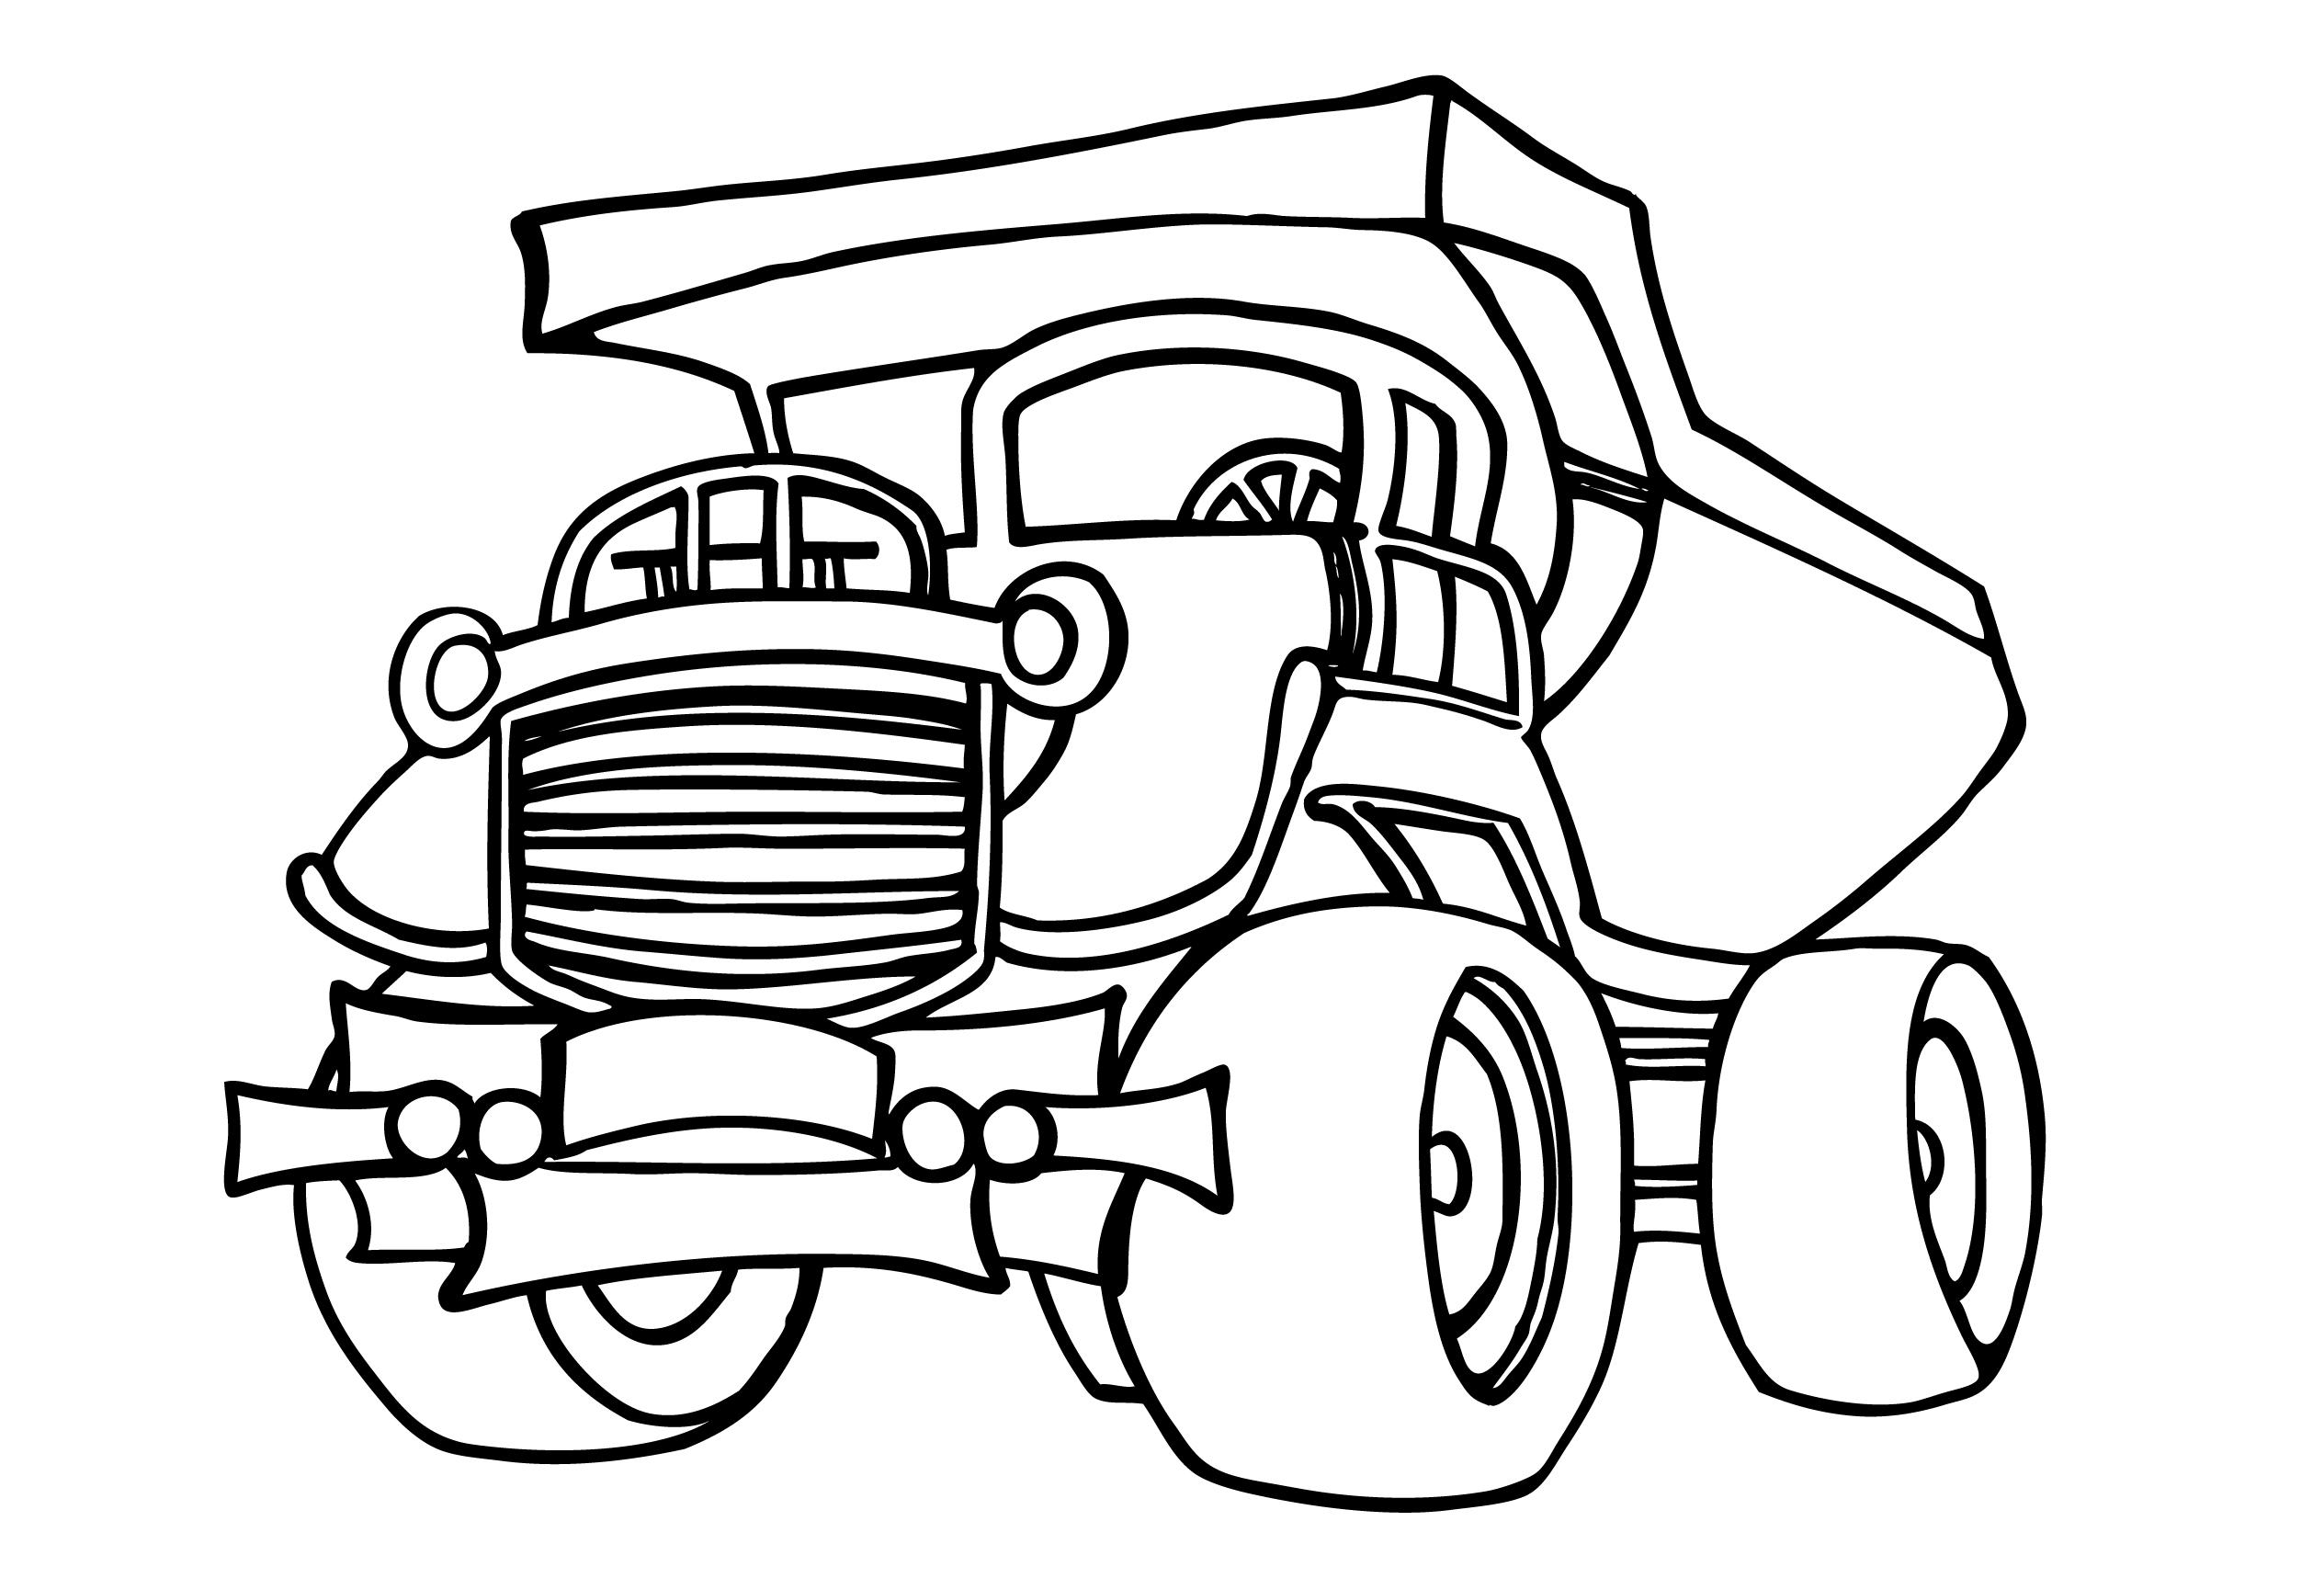 Tires clipart heavy equipment Construction%20equipment%20clipart Free Clip Construction Free